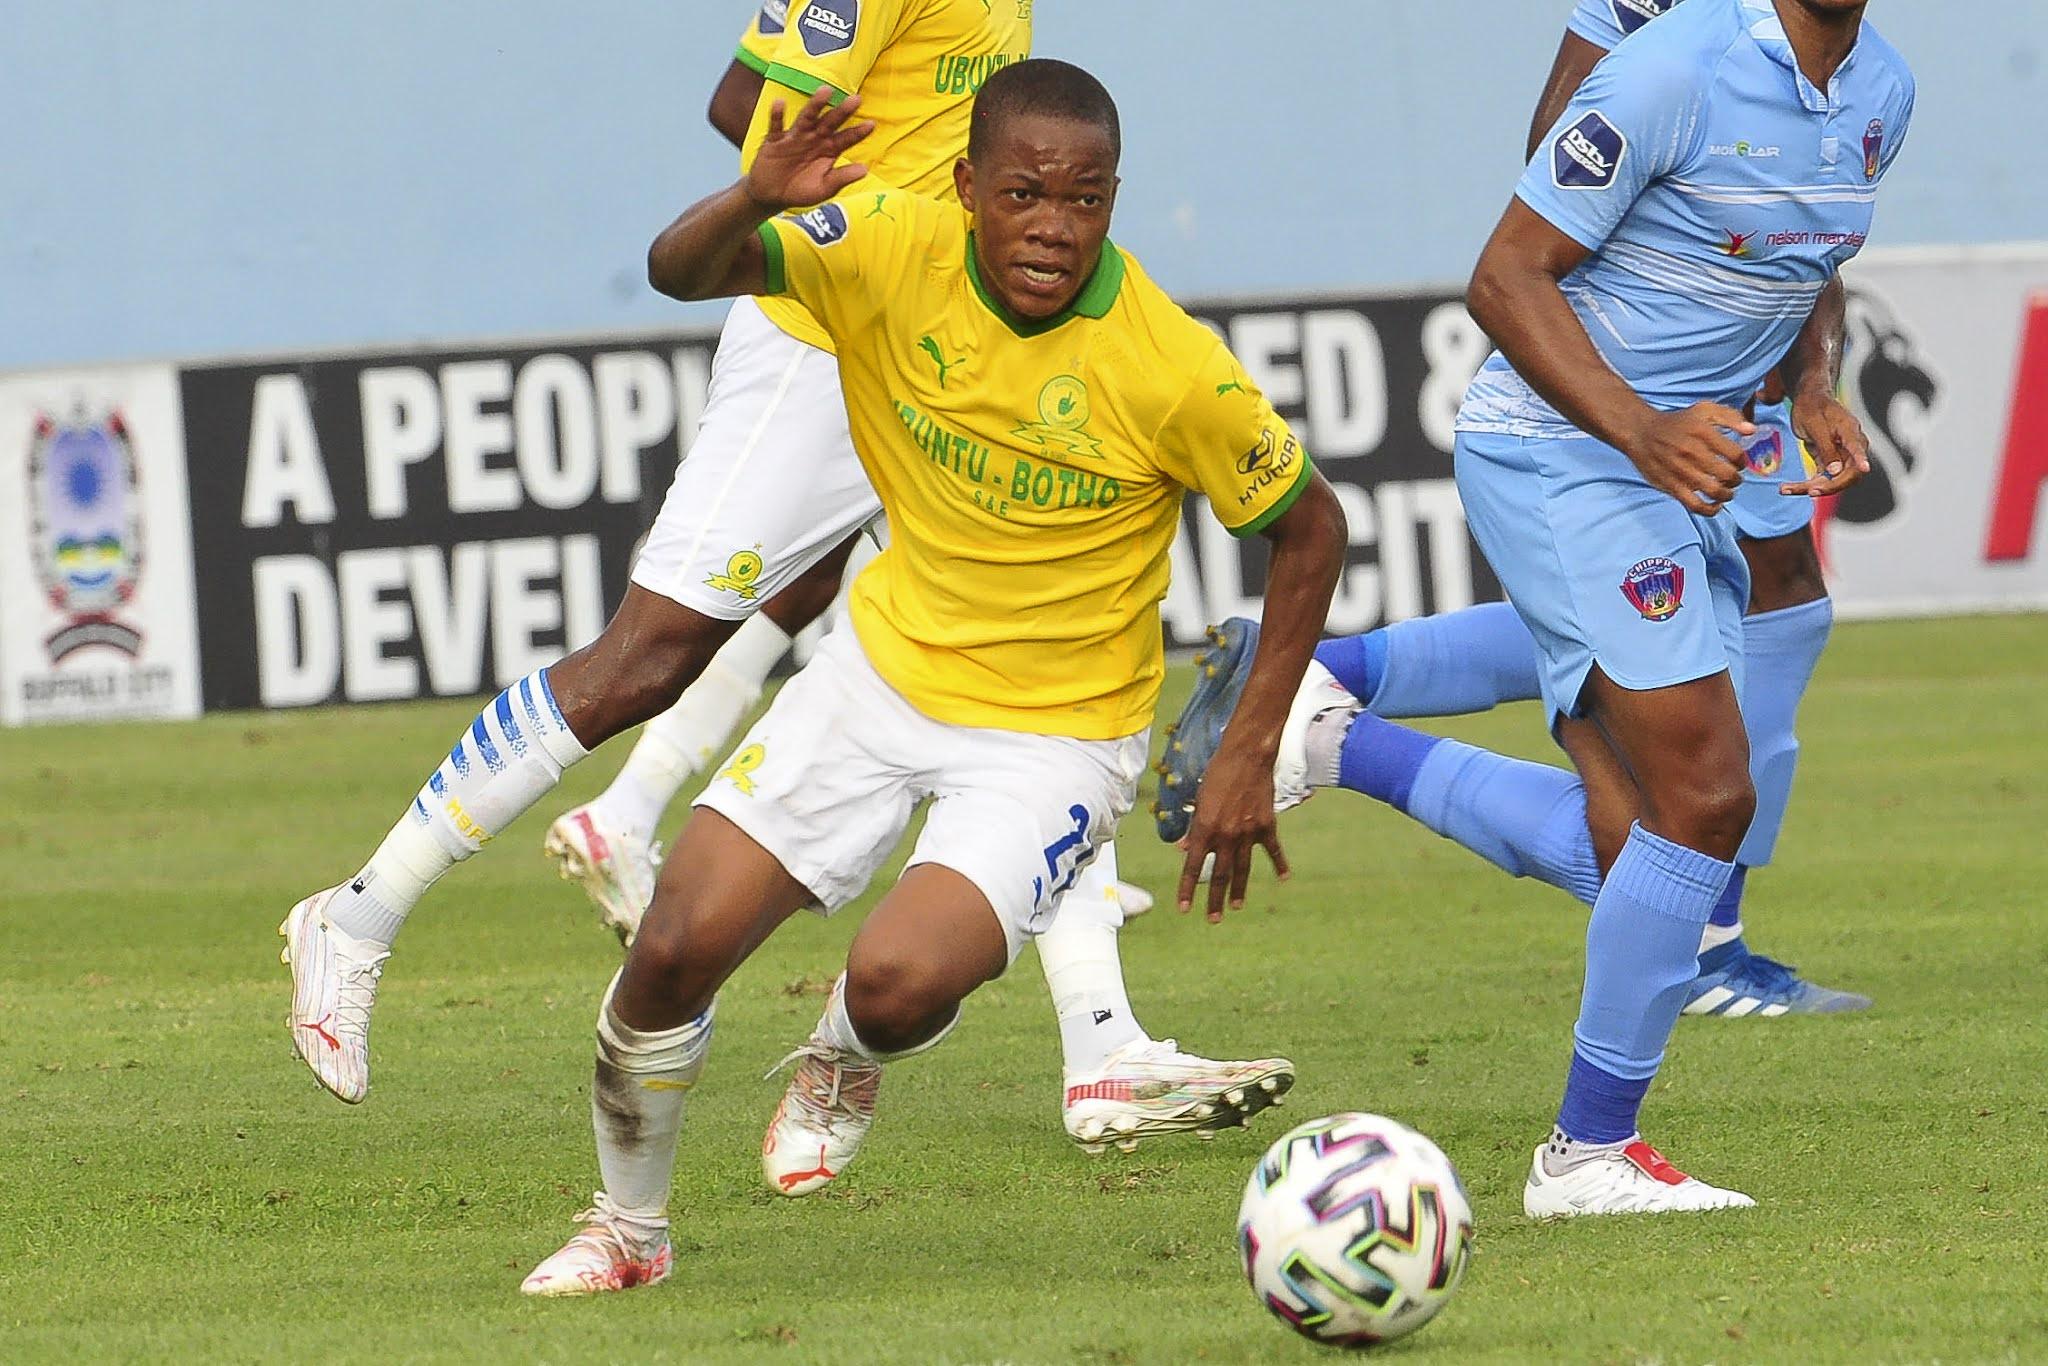 Mamelodi Sundowns midfielder Sphelele Mkhulise